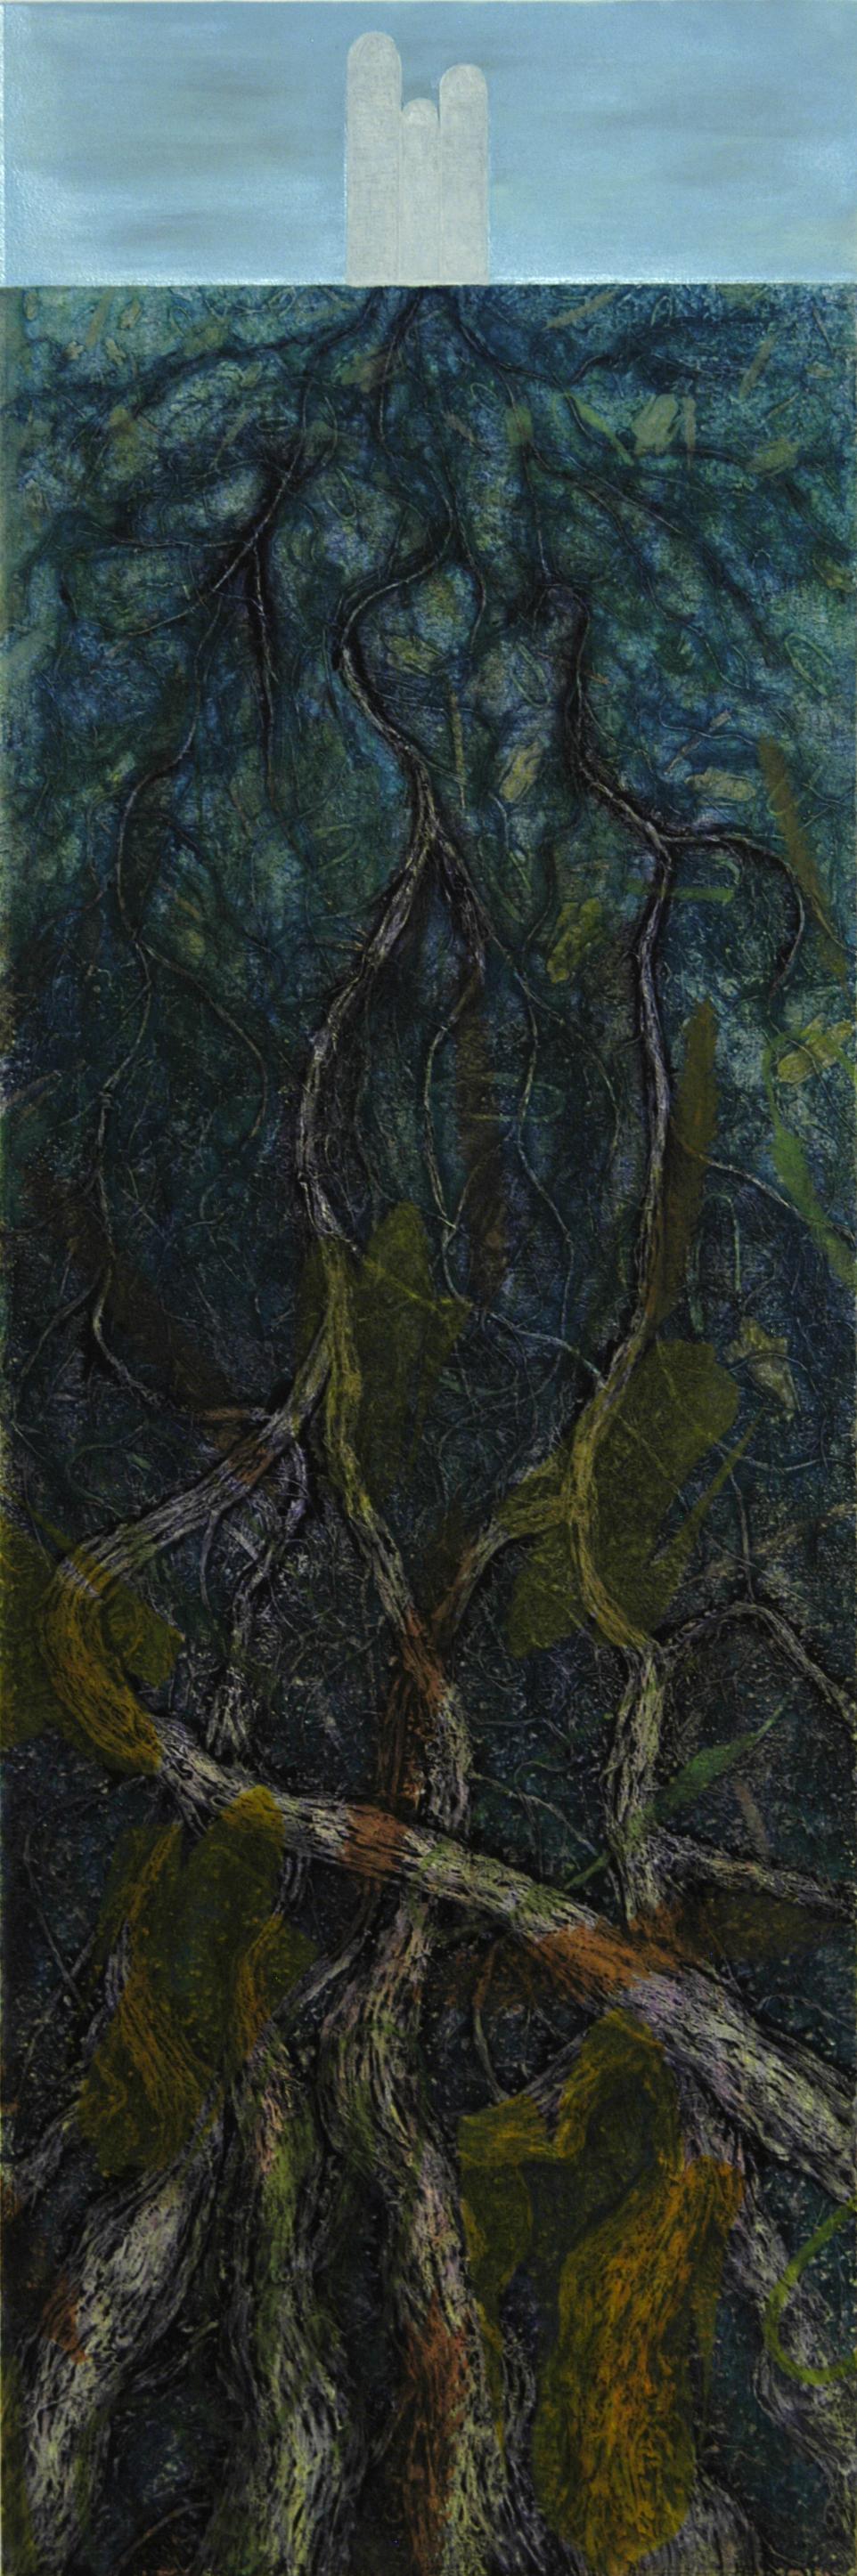 Sustenance Roots IV